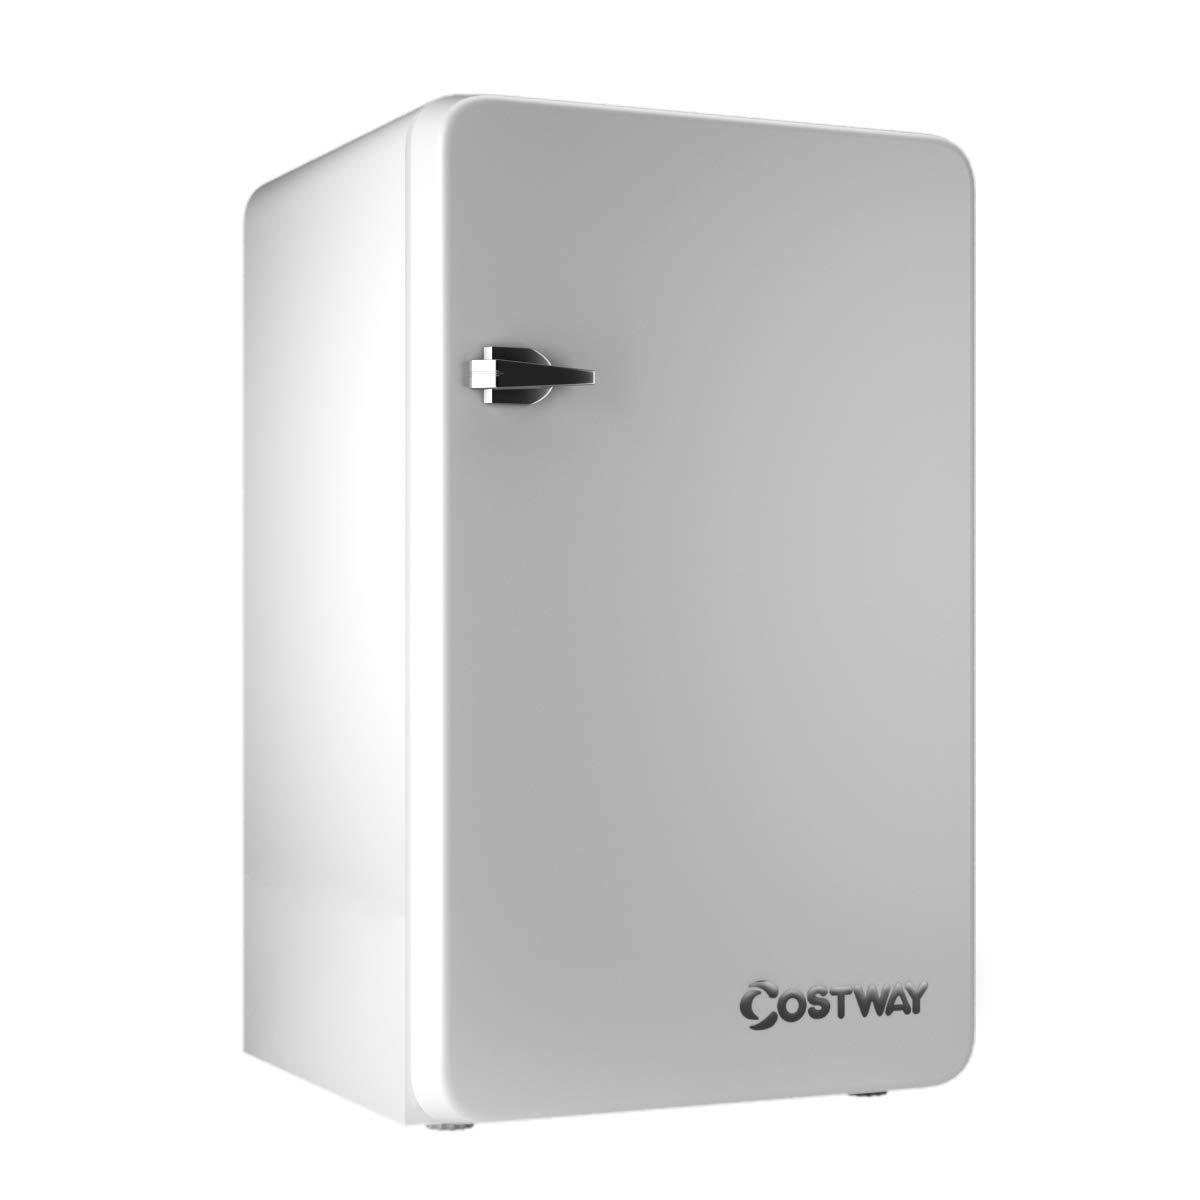 COSTWAY Compact Refrigerator, Single Door 3.2 cu. ft. Small Under Counter Mini Refrigerator Fridge Freezer Cooler Unit w/Handle for Dorm, Office, Apartment (White)